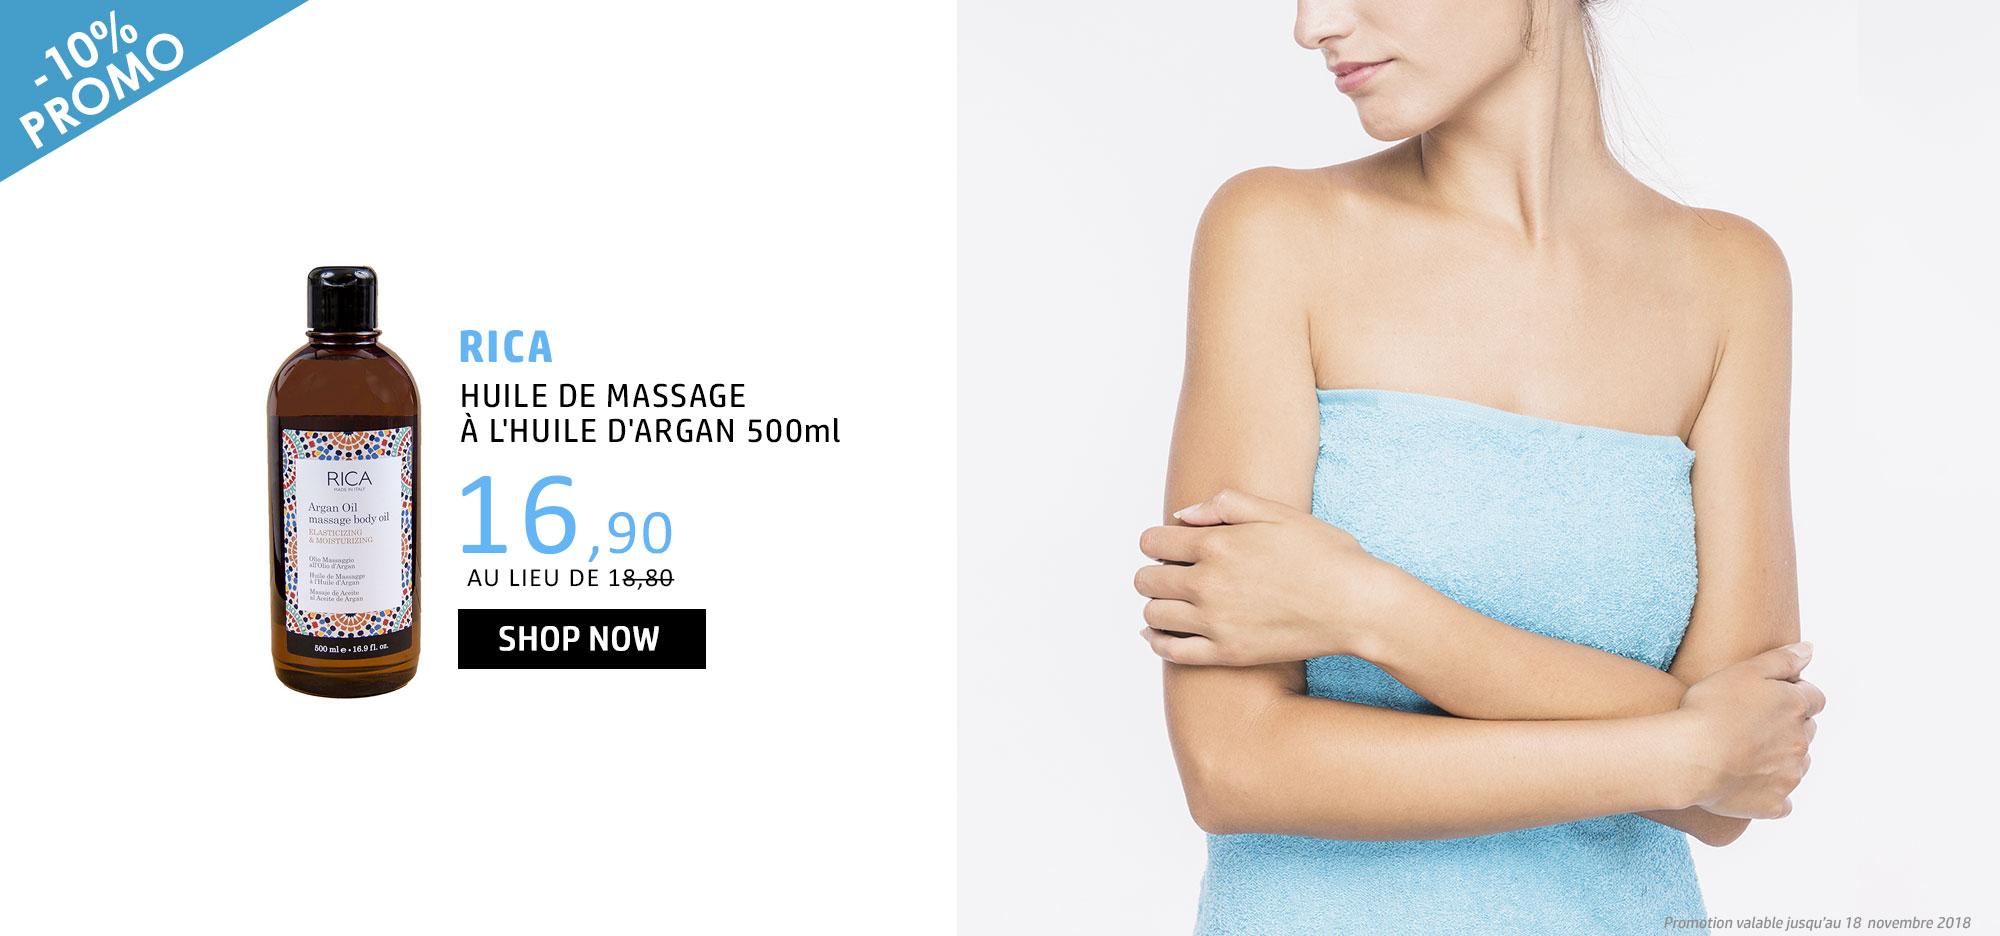 rica-argan-oil-massage-body-oil-500ml